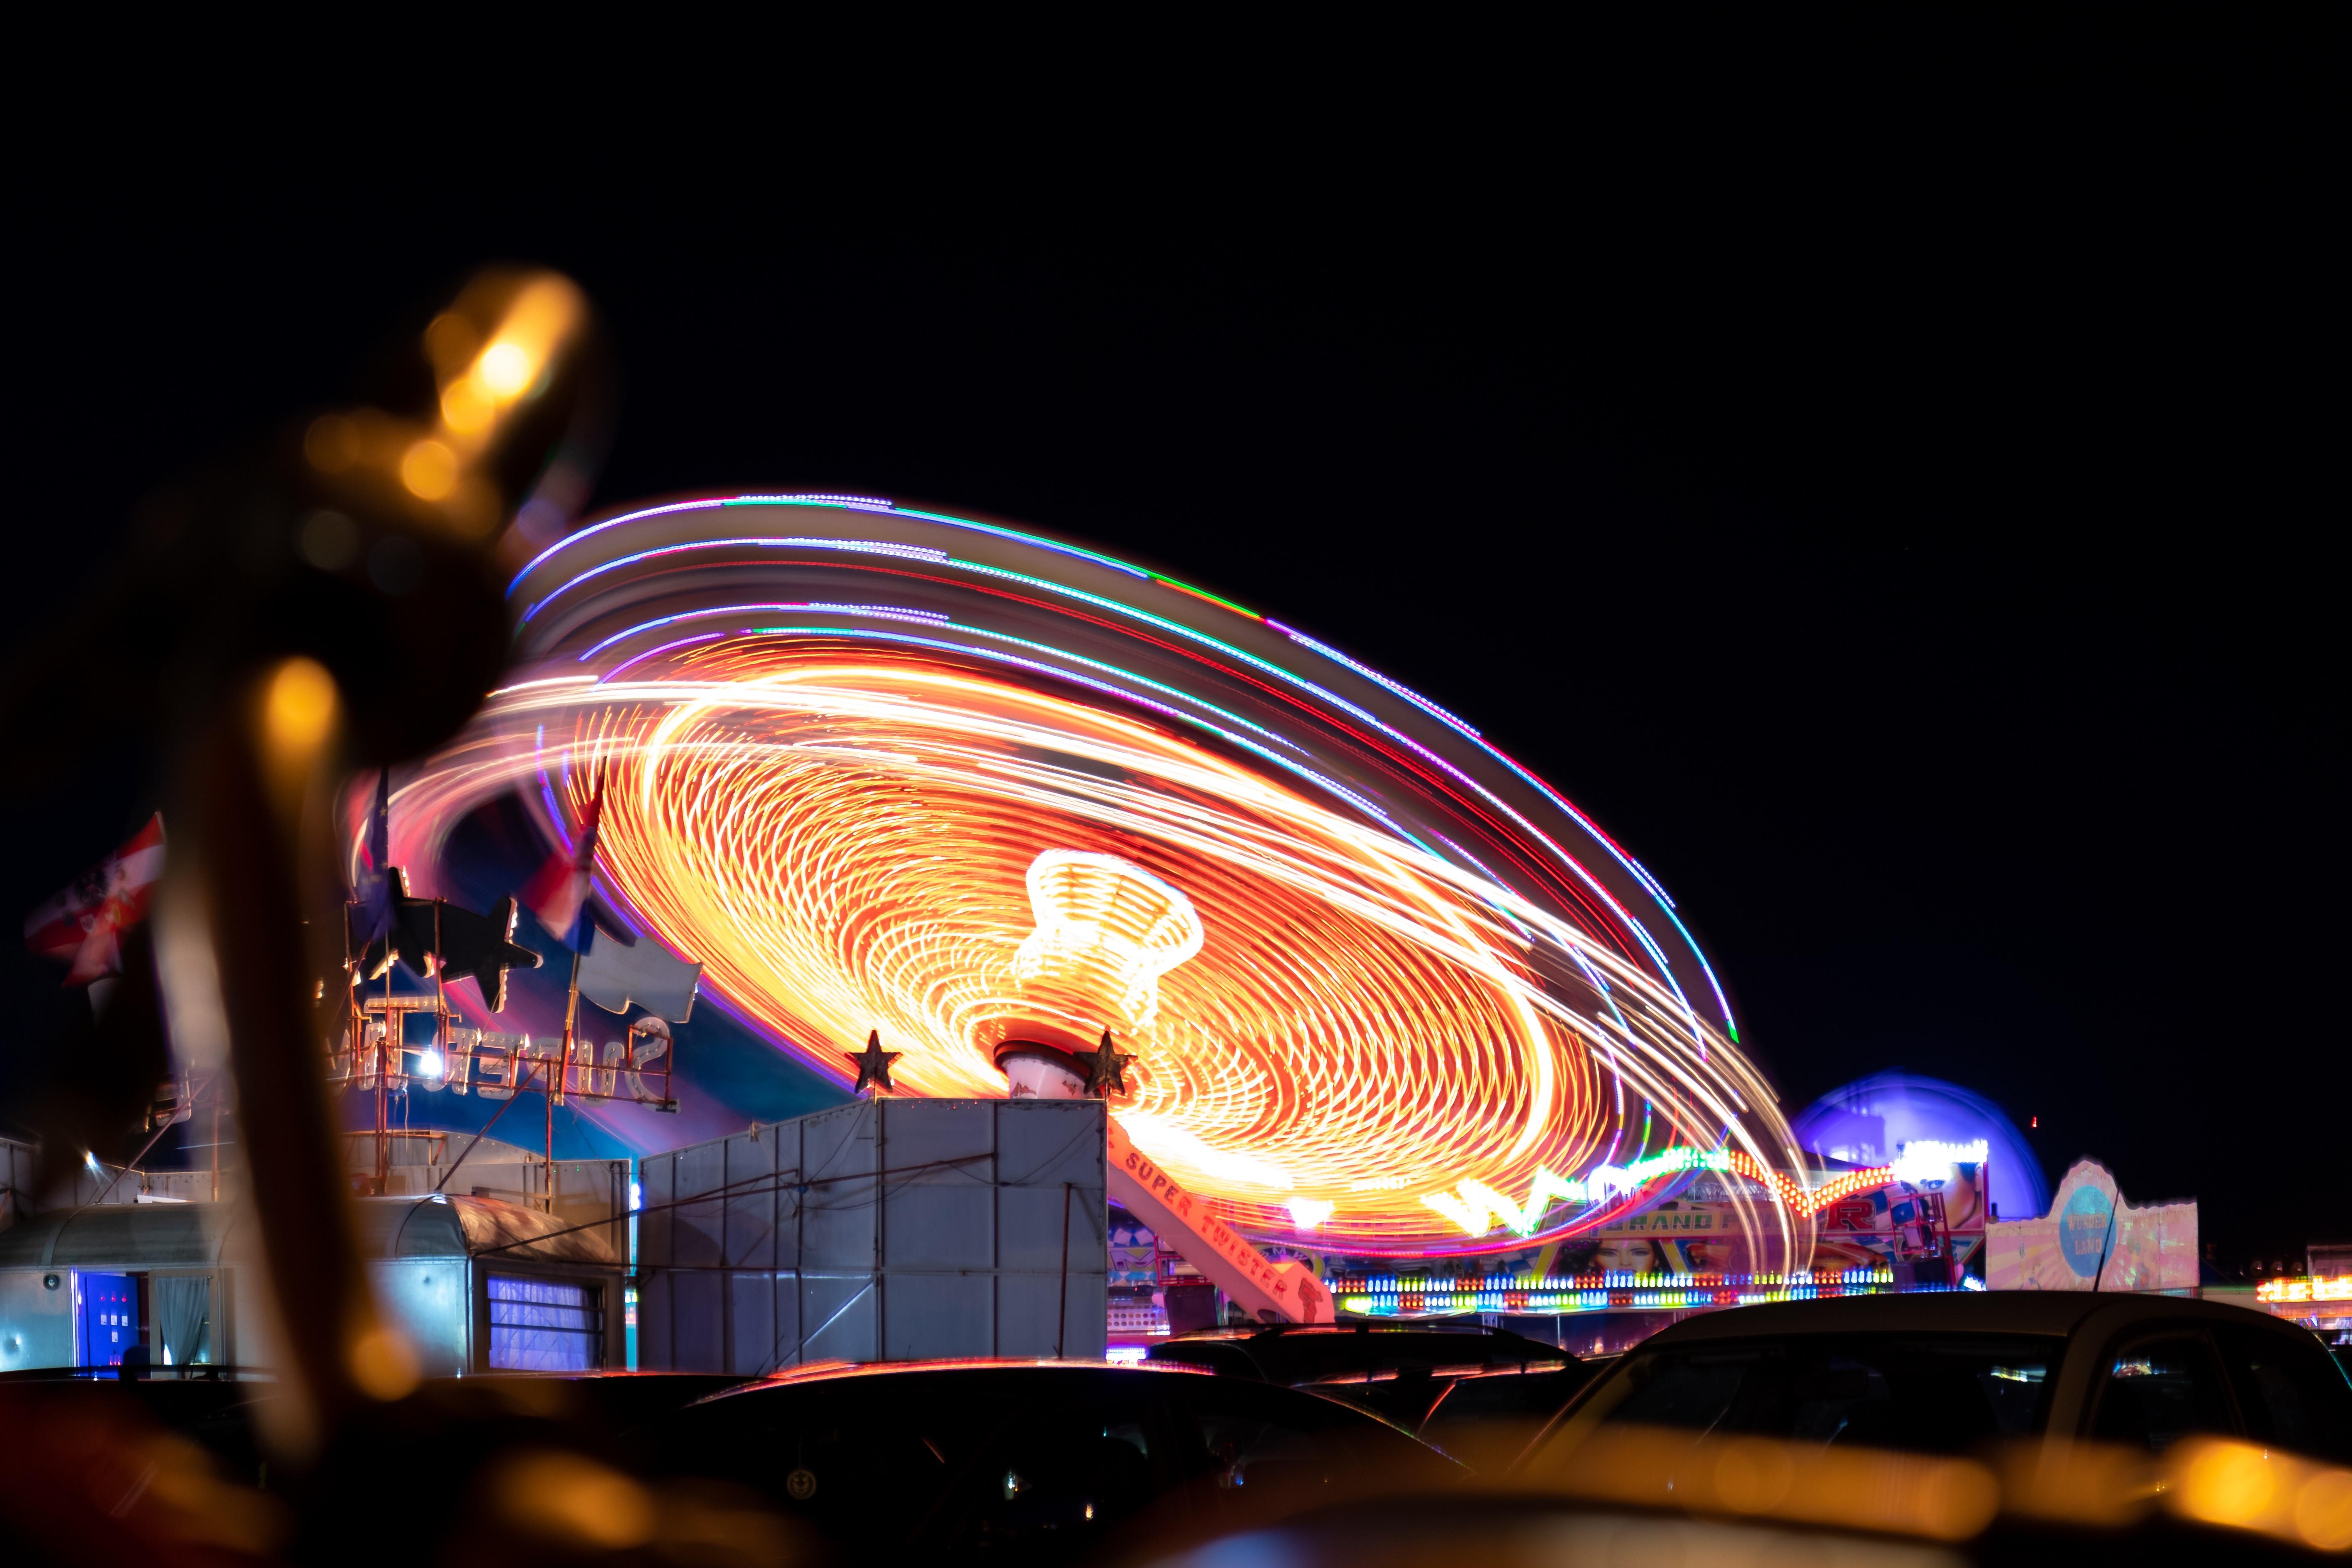 turned on lights on carnival